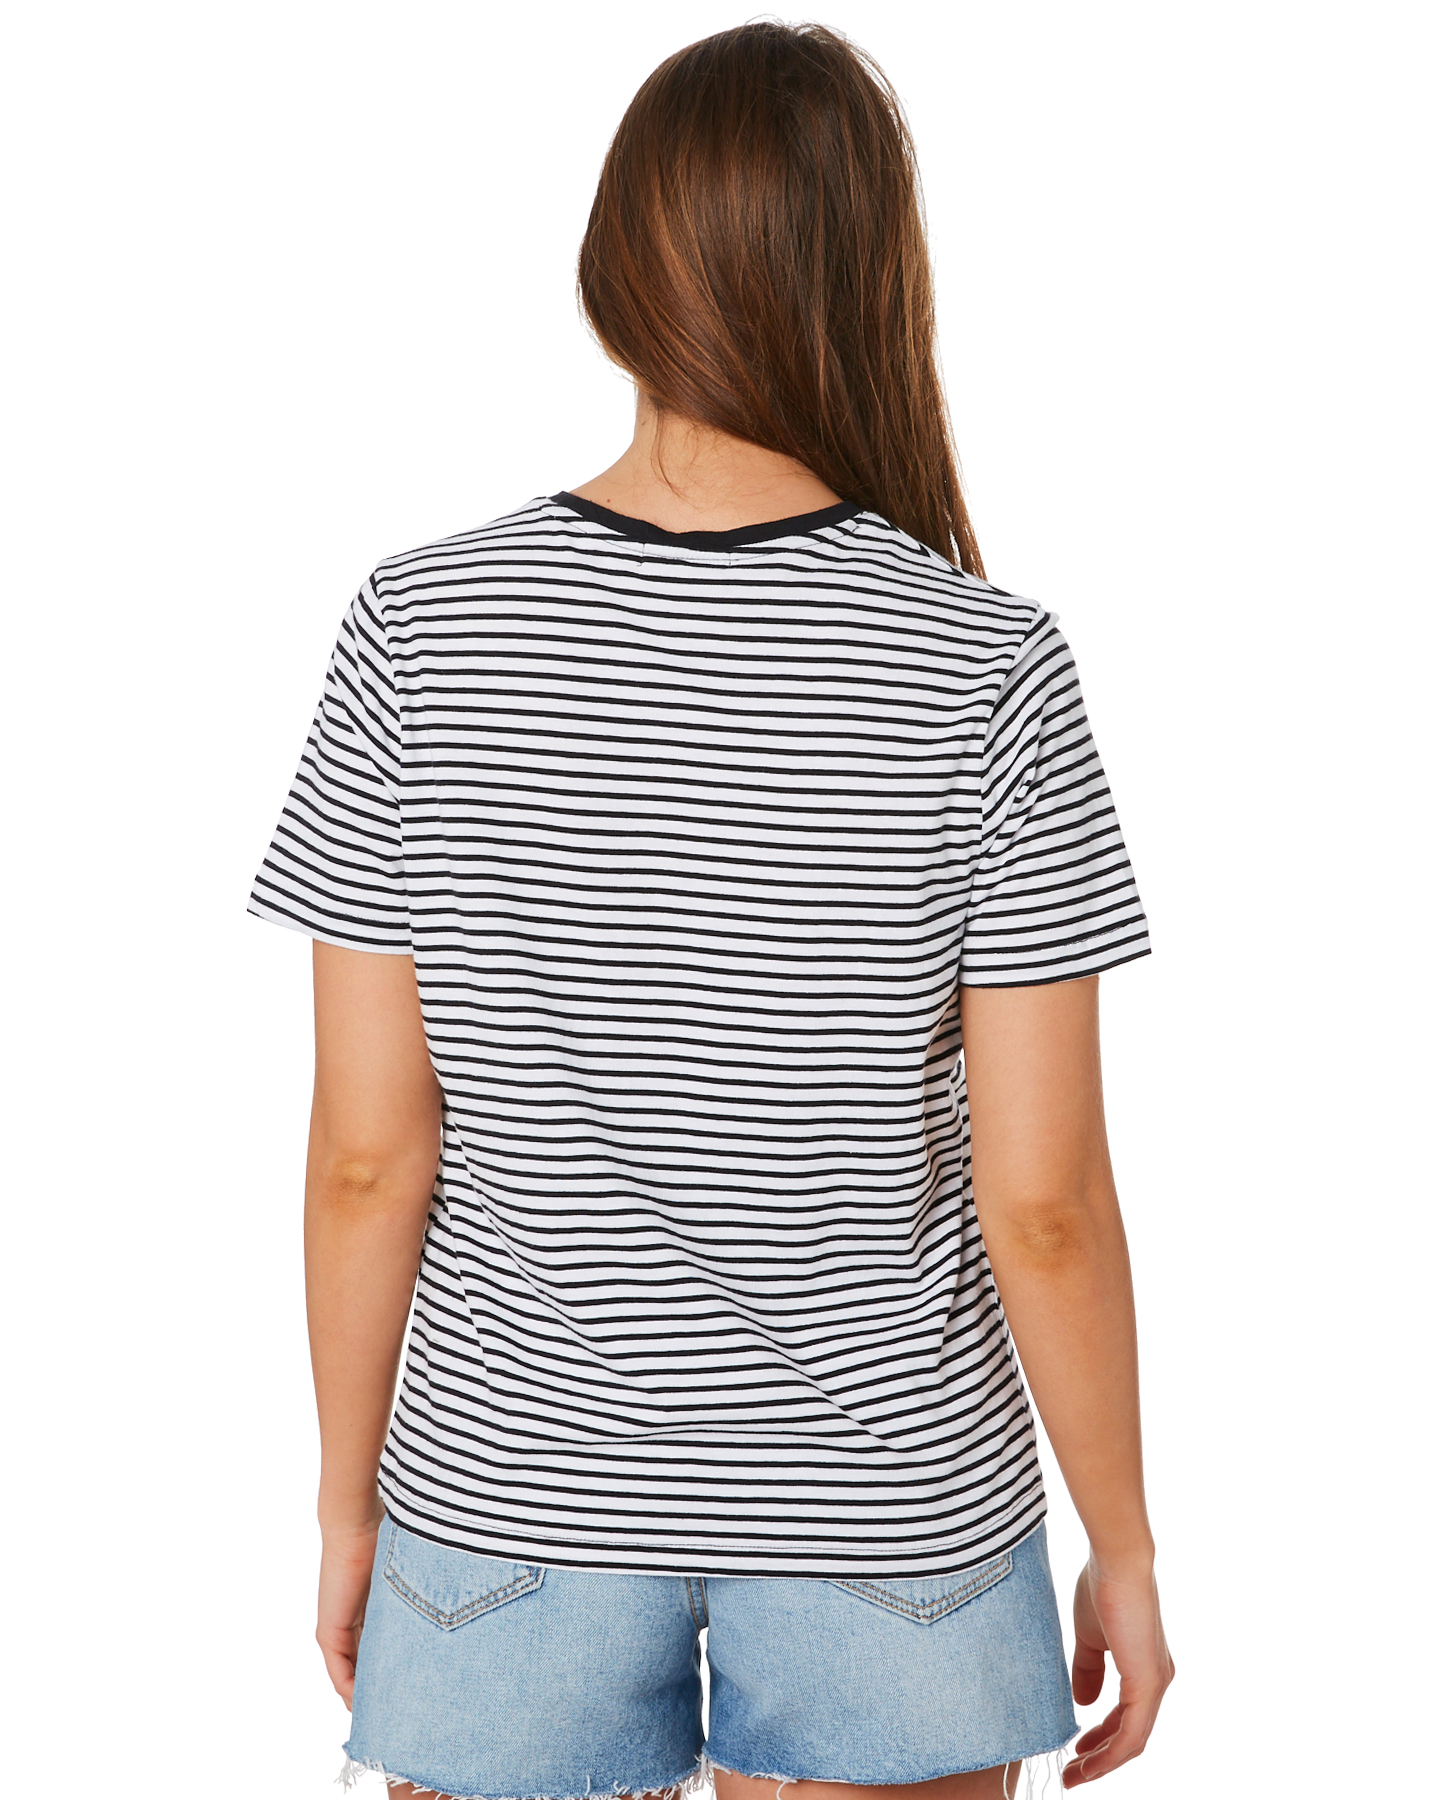 New-Swell-Women-039-s-Jesse-Stripe-Tee-Crew-Neck-Short-Sleeve-Cotton thumbnail 8